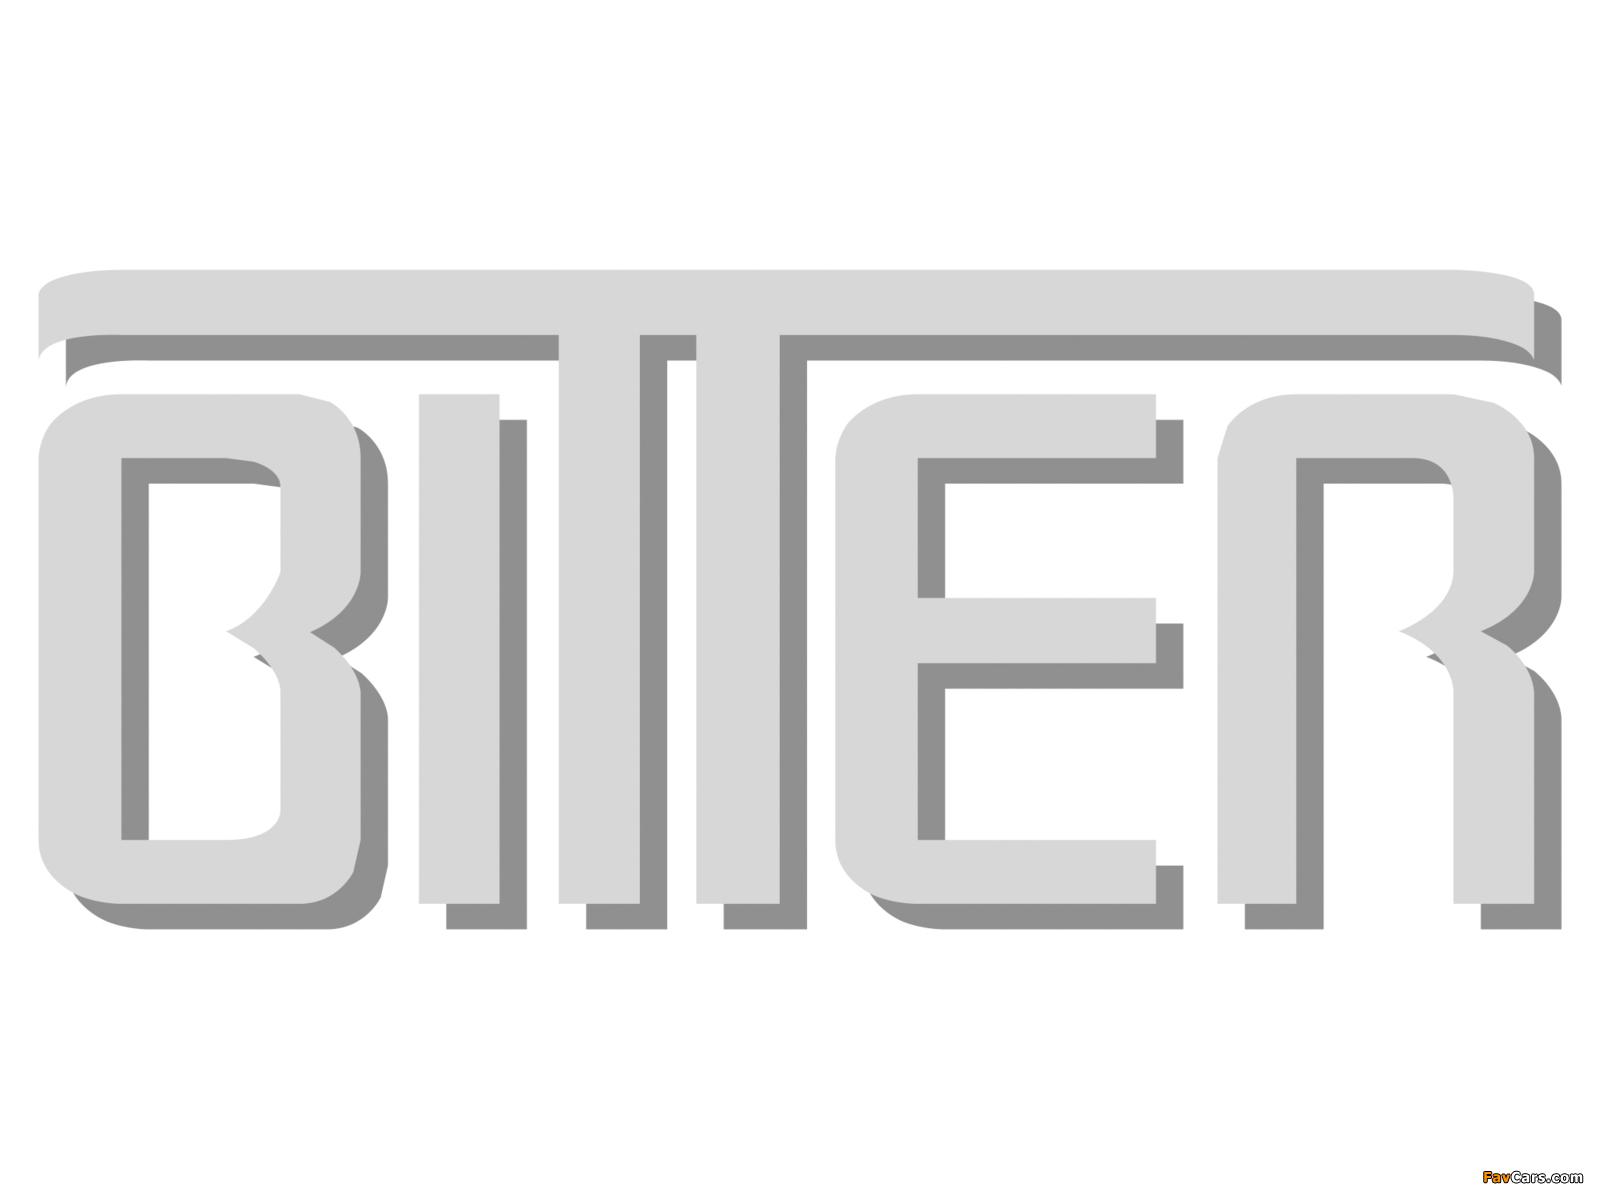 Photos of Bitter (1600 x 1200)